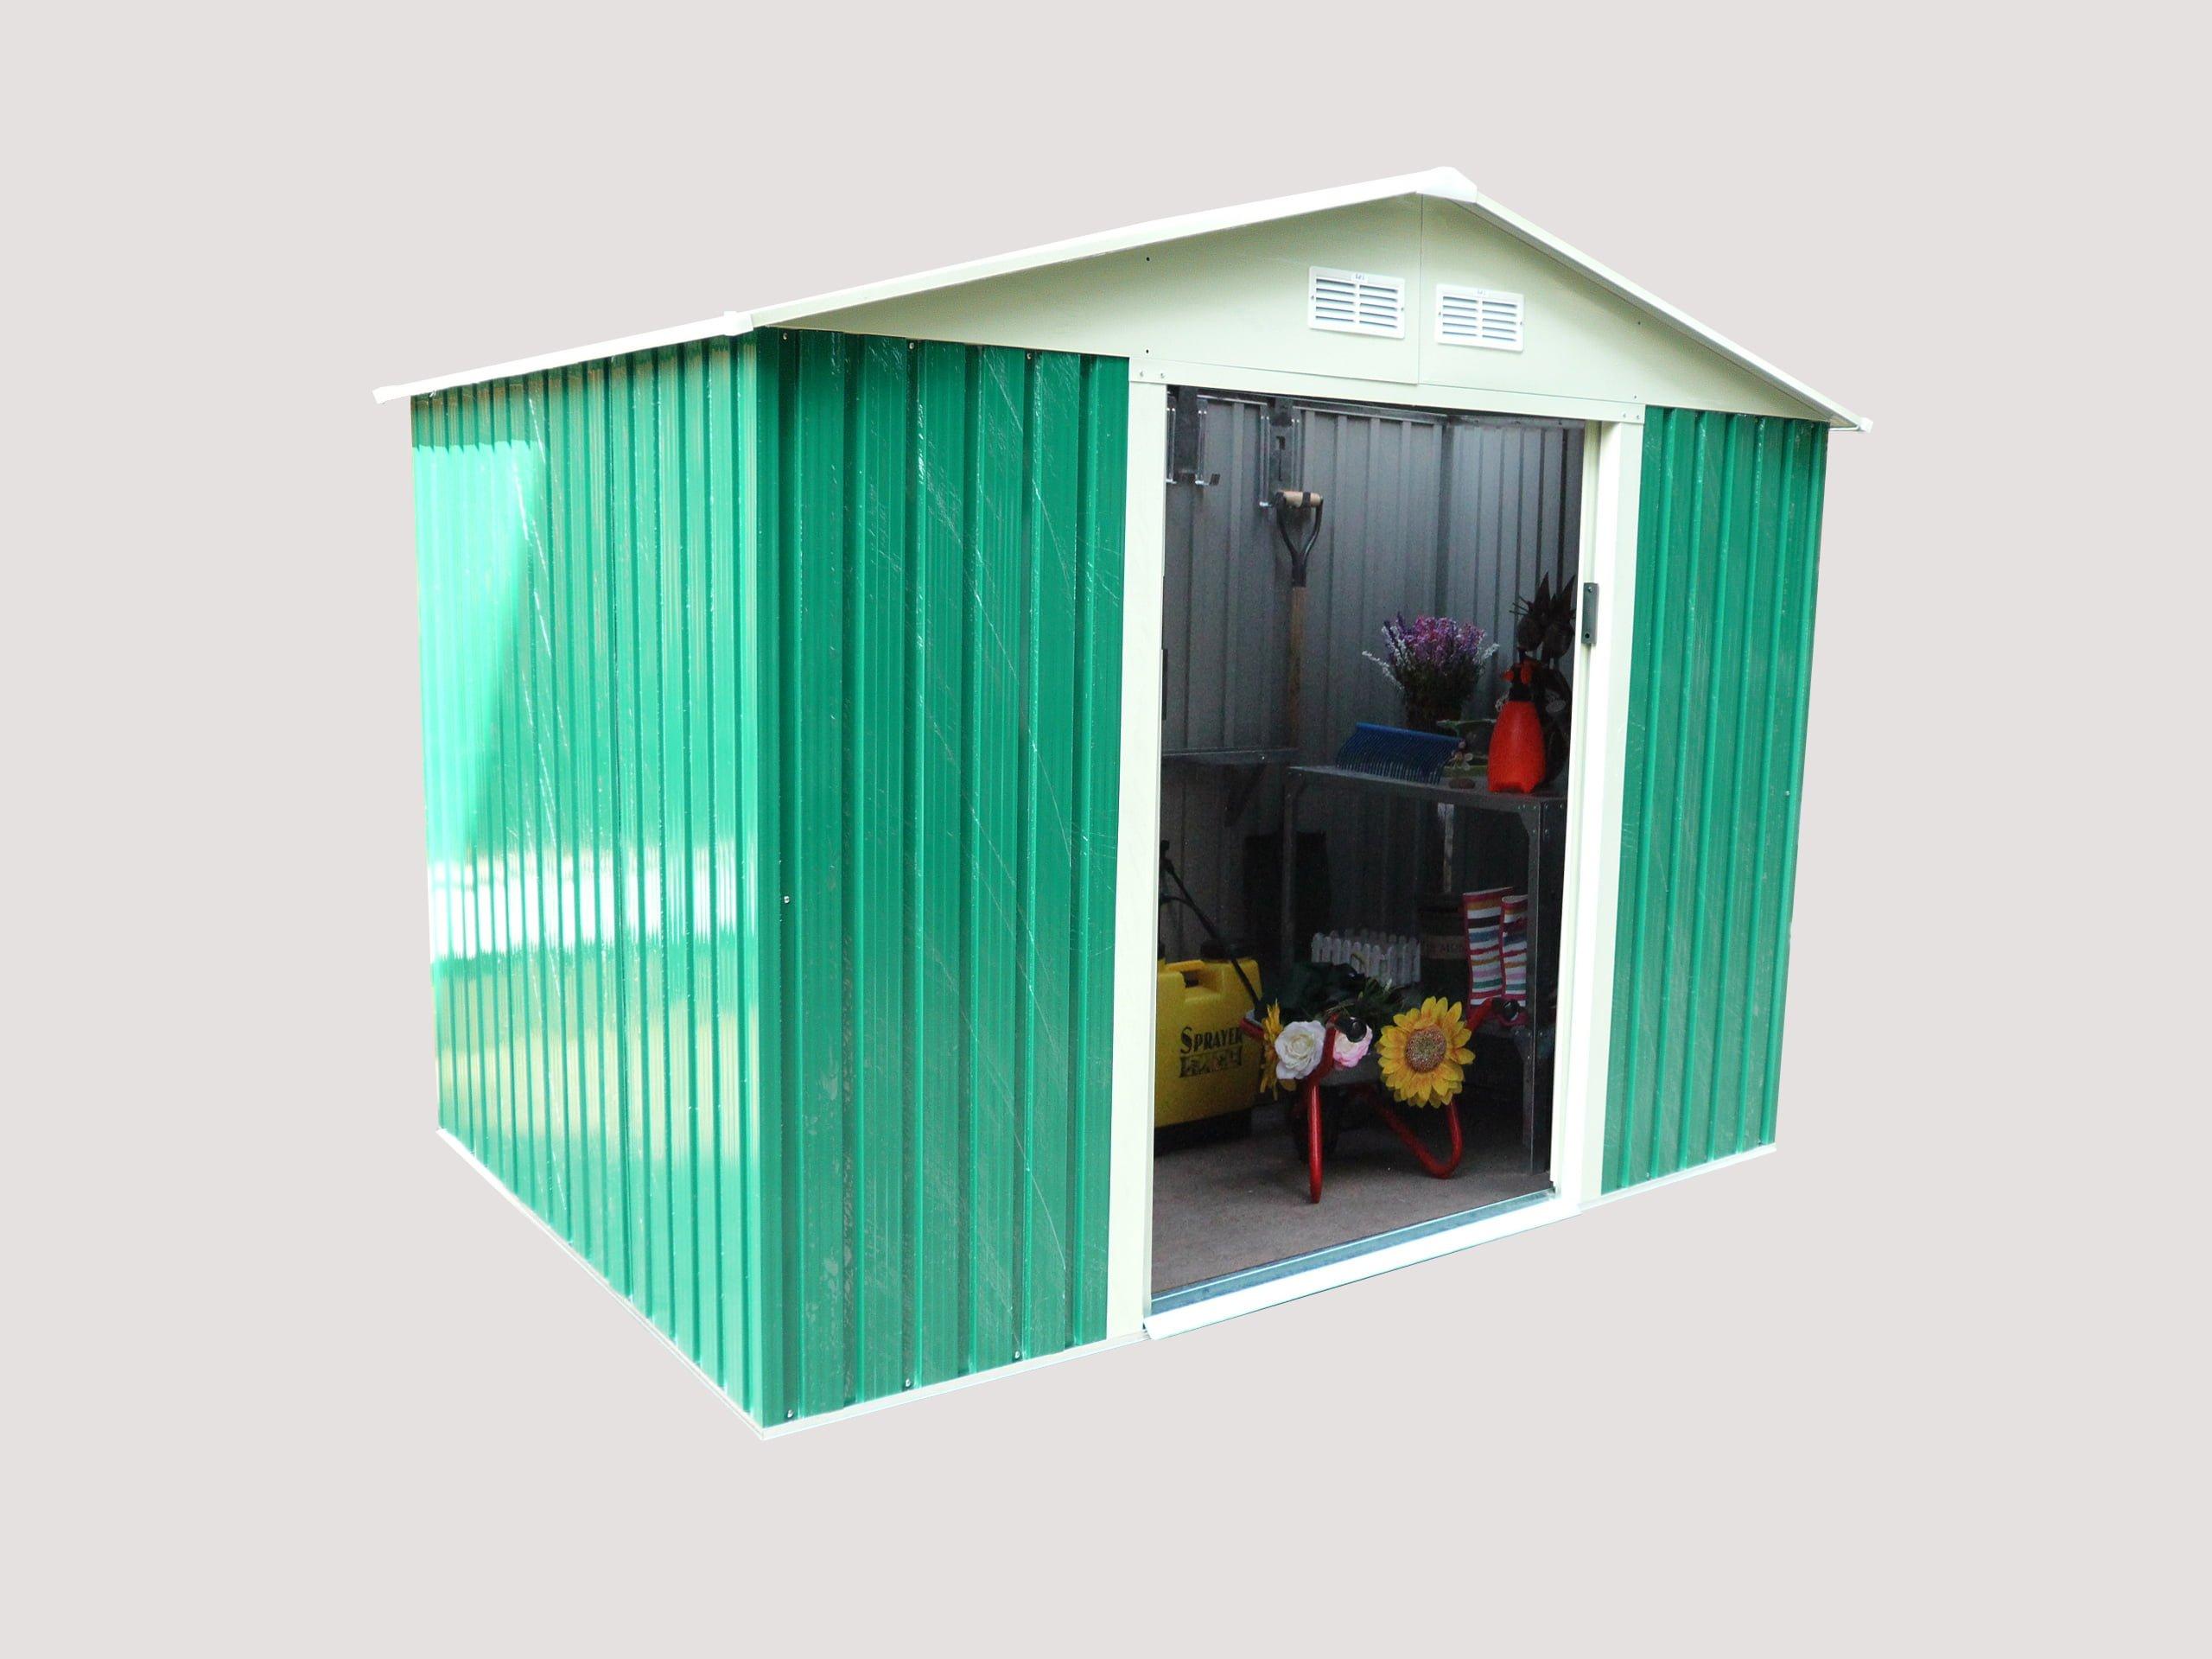 Galpon para jardin lct1b la casa del trailer for Galpon de madera para jardin